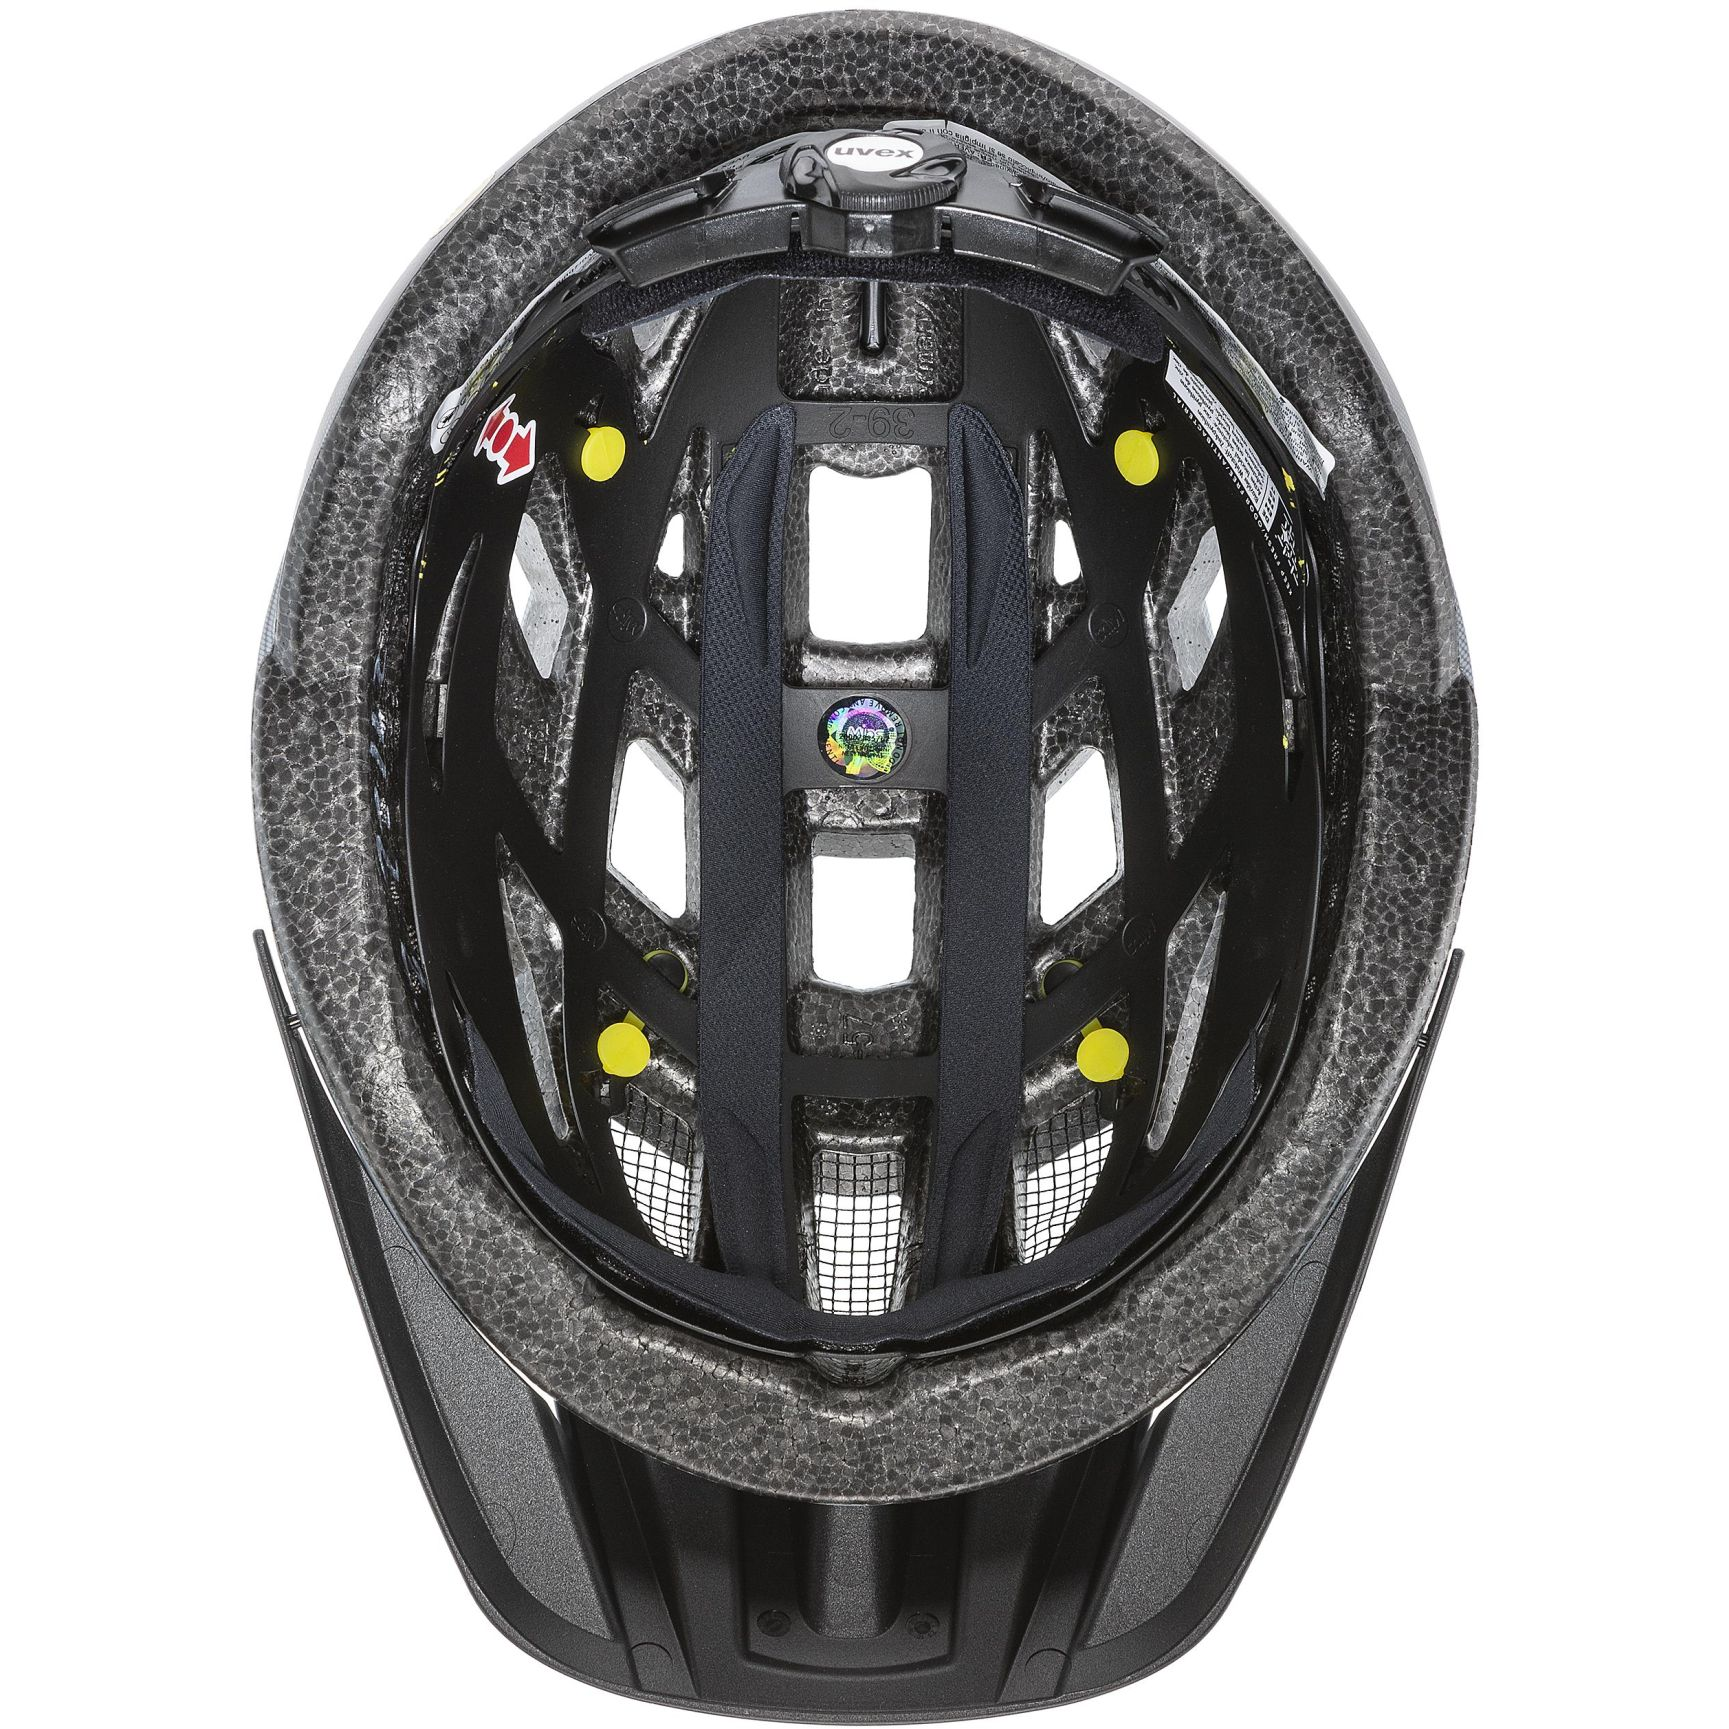 Image of Uvex i-vo cc MIPS Helmet - dove grey mat